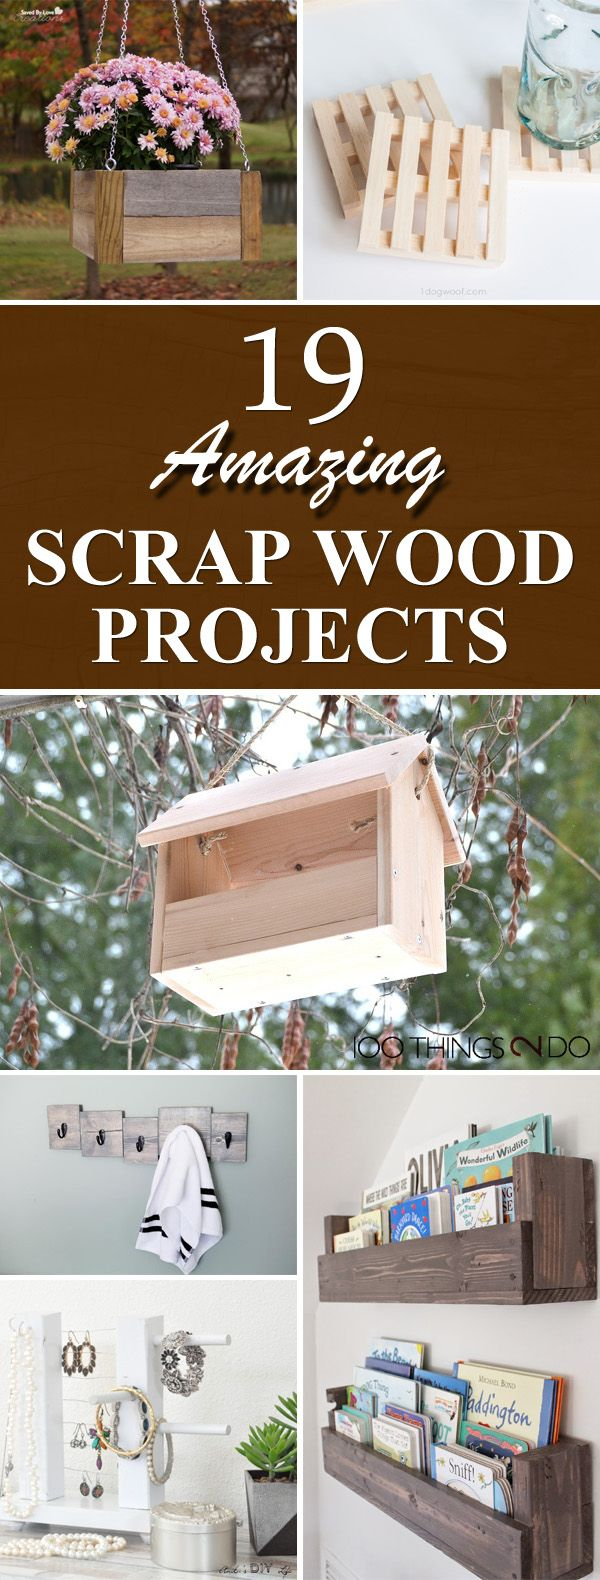 19 Amazing DIY Scrap Wood Projects 10193